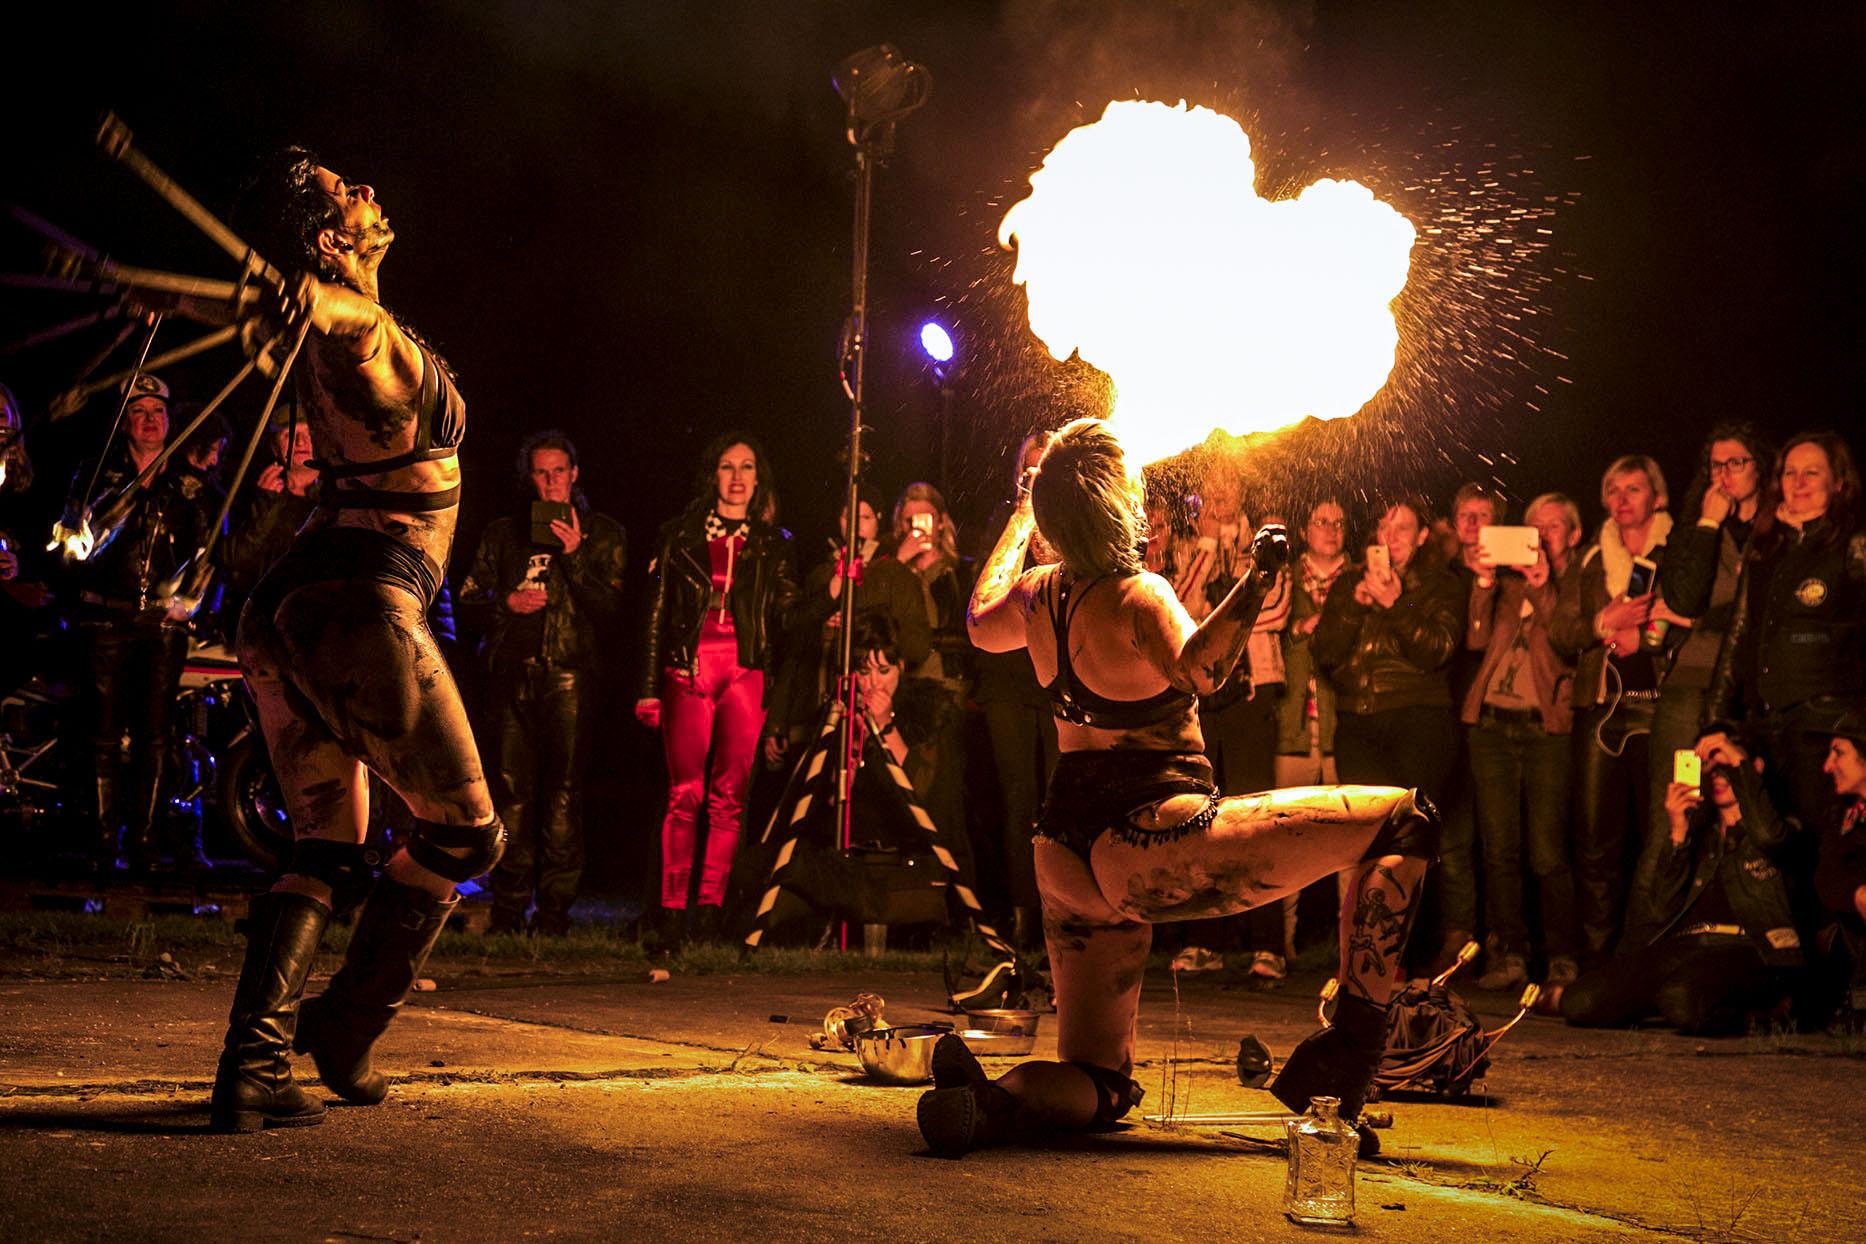 Fire dancers at Petrolettes Festival